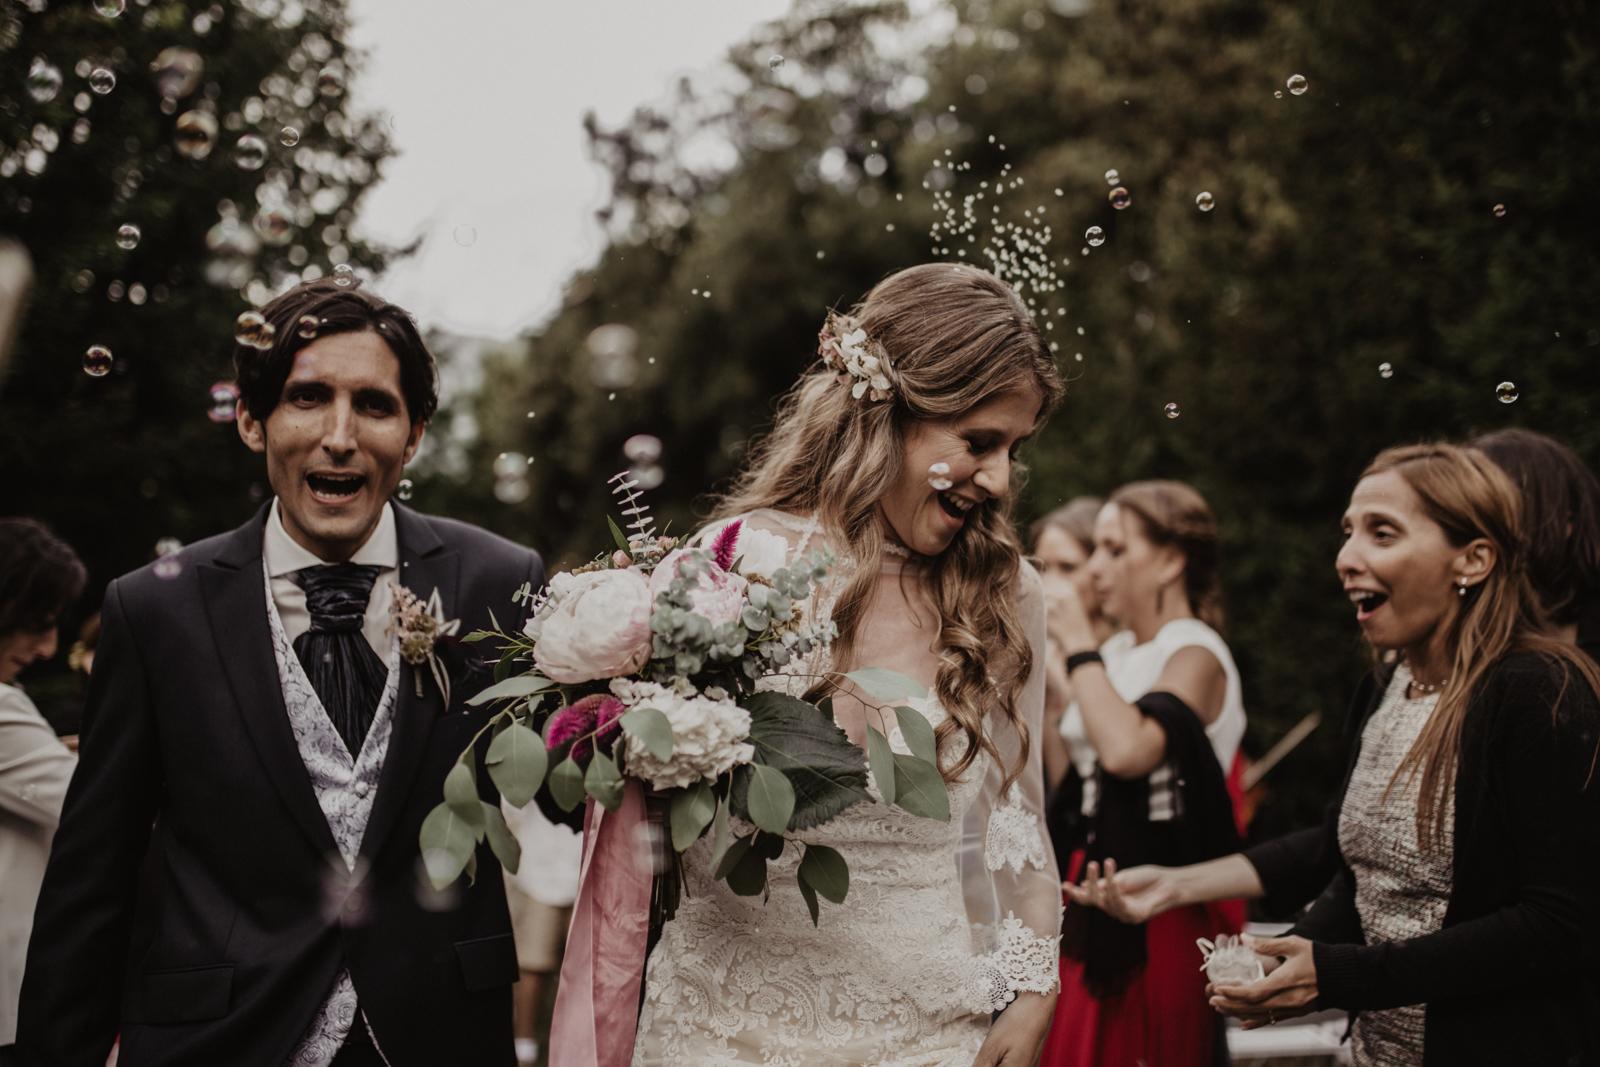 thenortherngirlphotography_photography_thenortherngirl_rebeccascabros_wedding_weddingphotography_weddingphotographer_barcelona_bodaenbarcelona_bodaenmaselmarti_bodarogeryvane-486.jpg